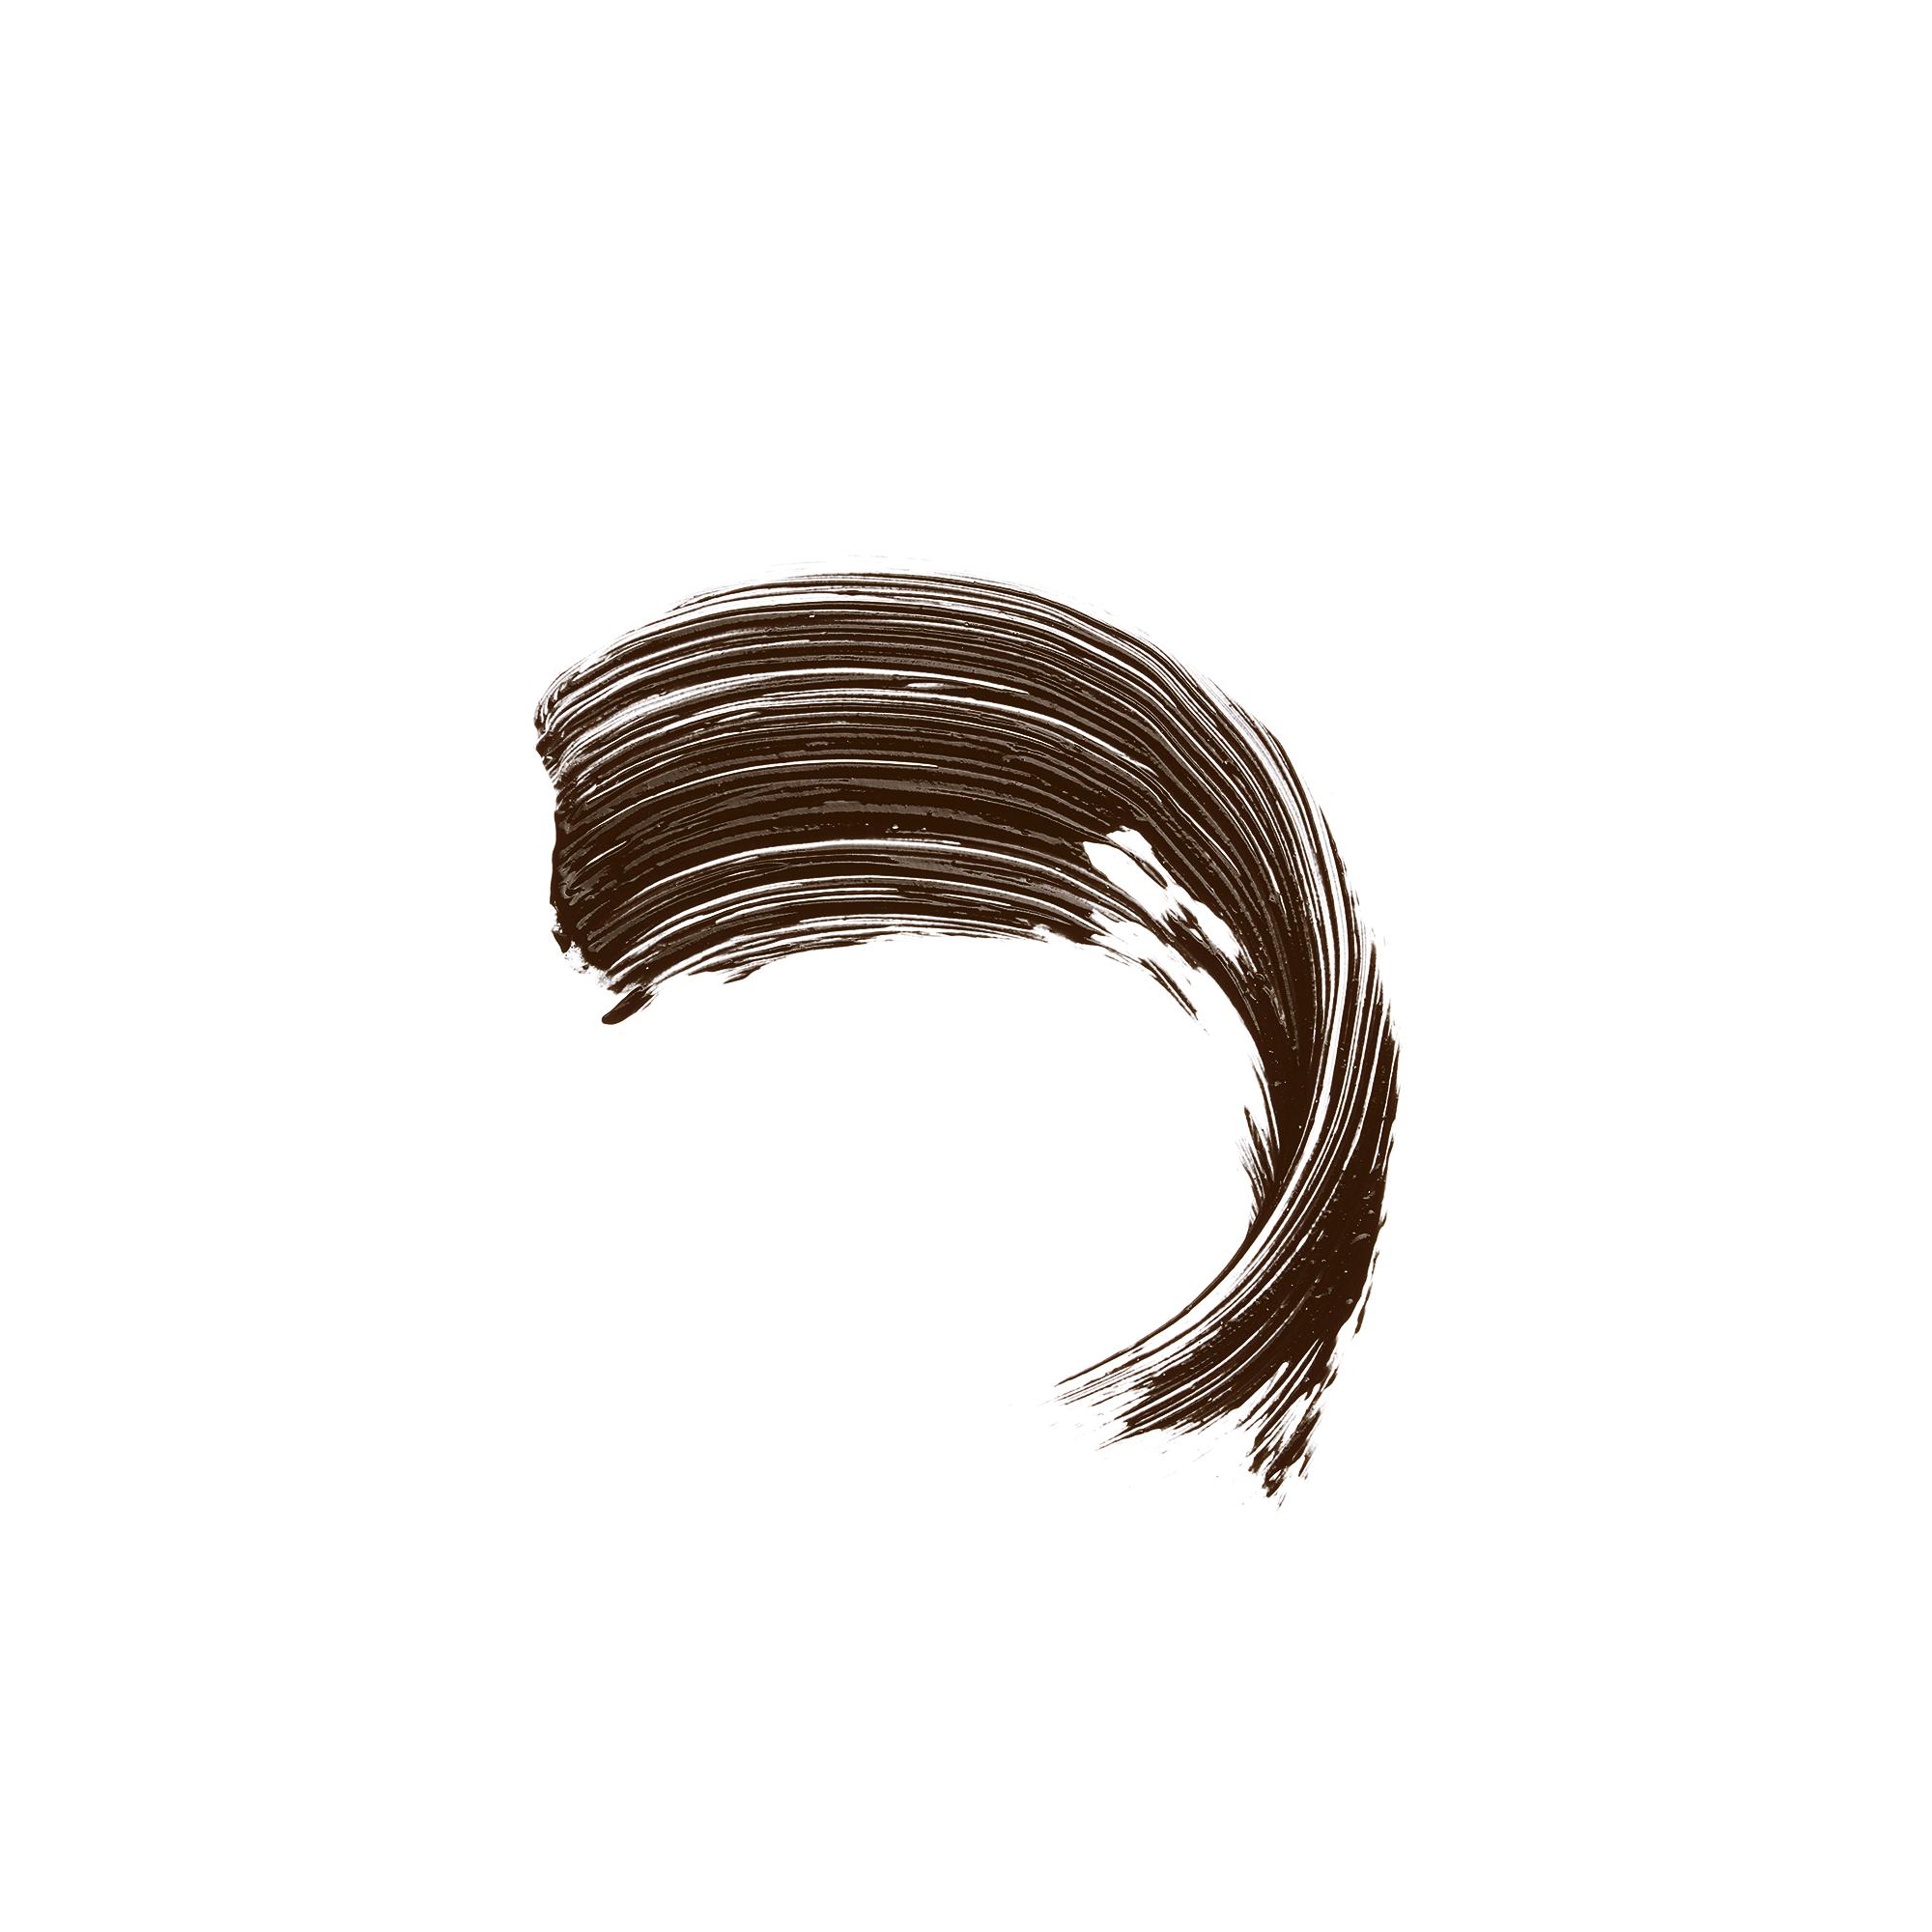 Couleur Caramel COULEUR CARAMEL : Mascara  BIO BACSKTAGE  Brun #32